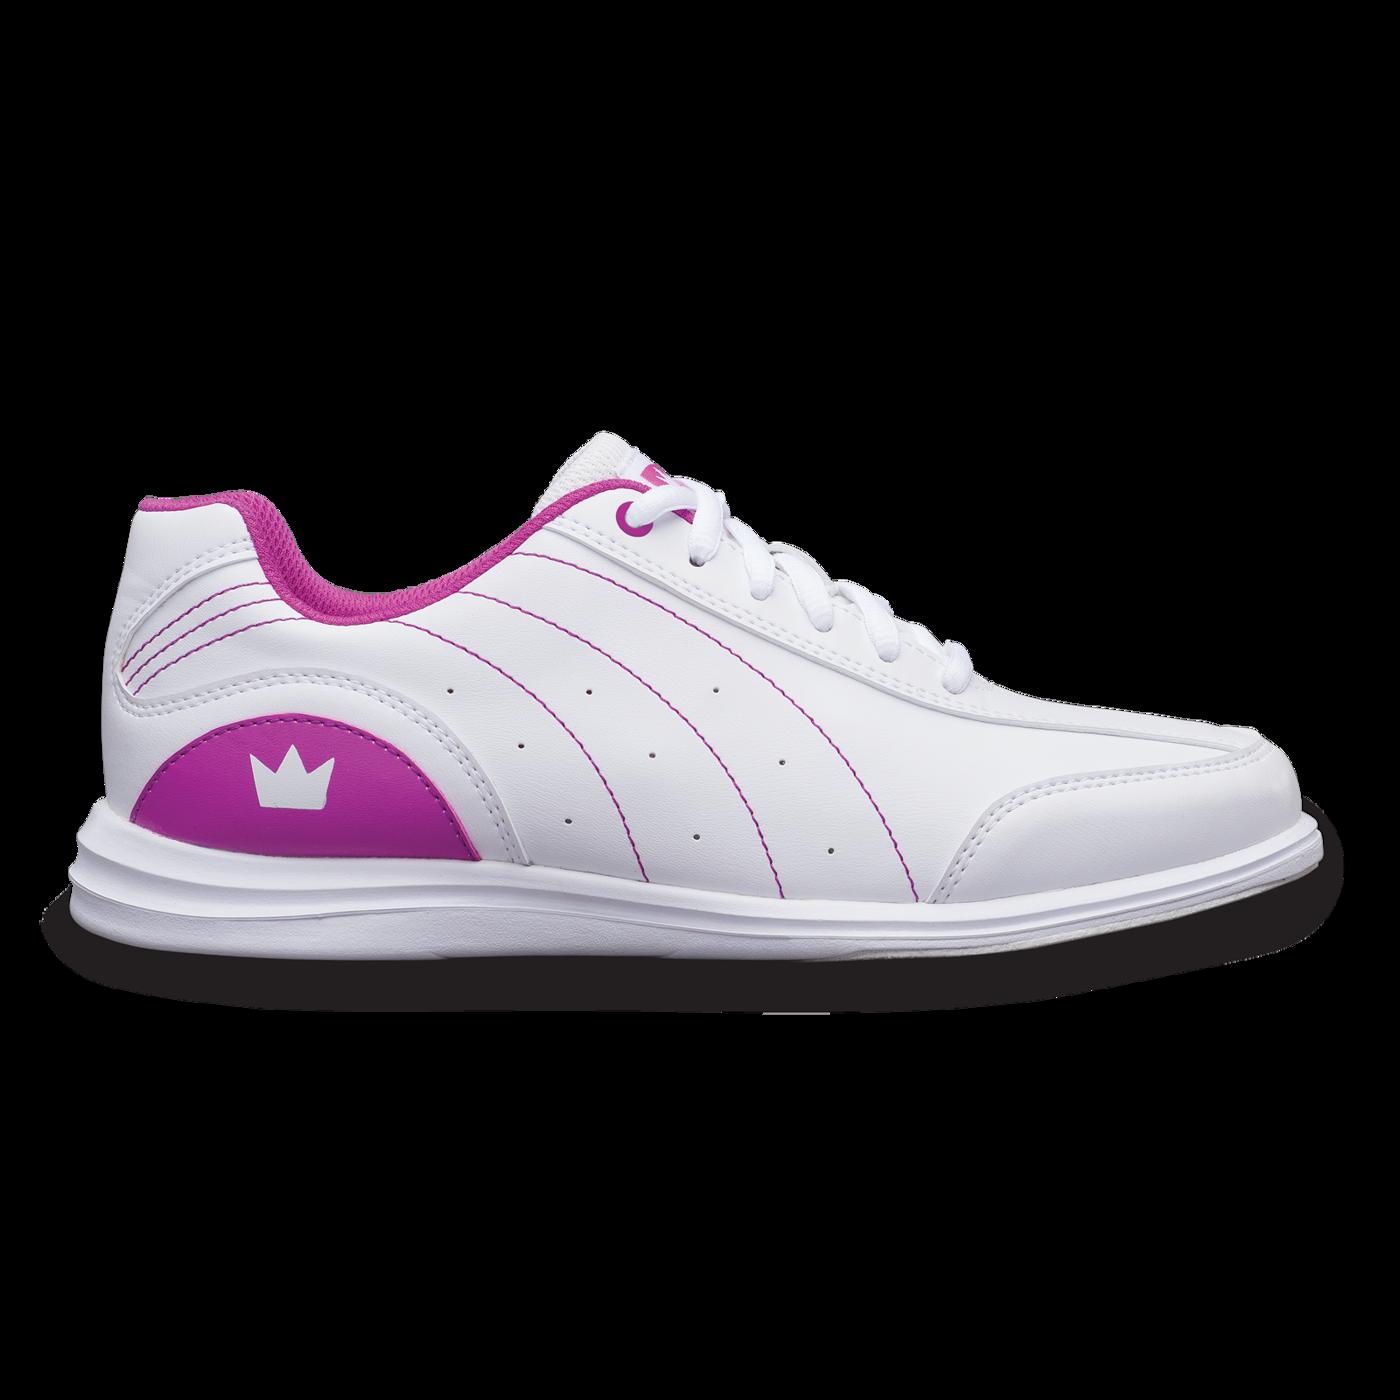 Brunwick Mystic White/Fuchsia Youth Girls Bowling Shoes